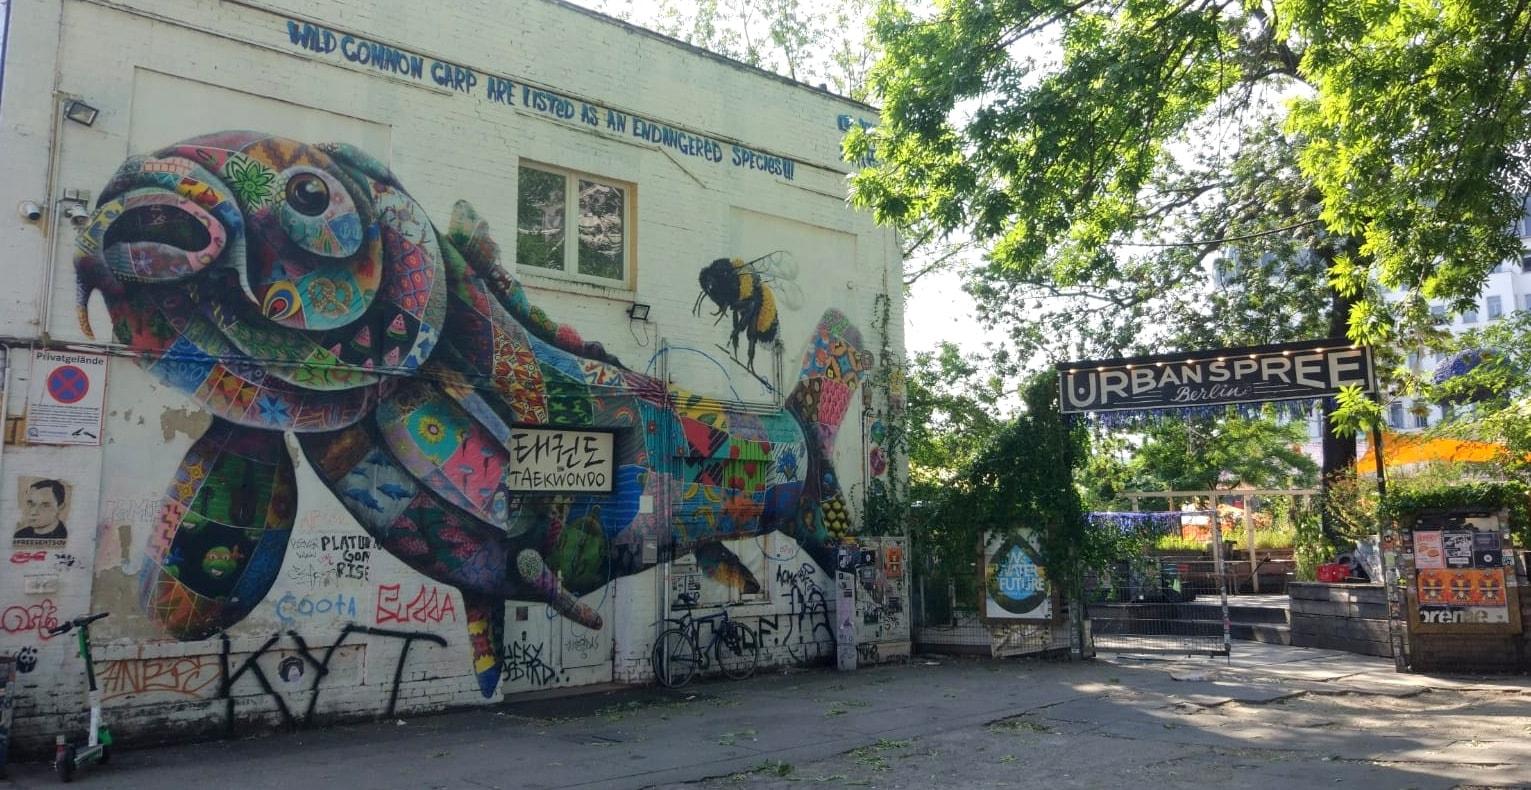 Urban Spree Berlin Urban Art